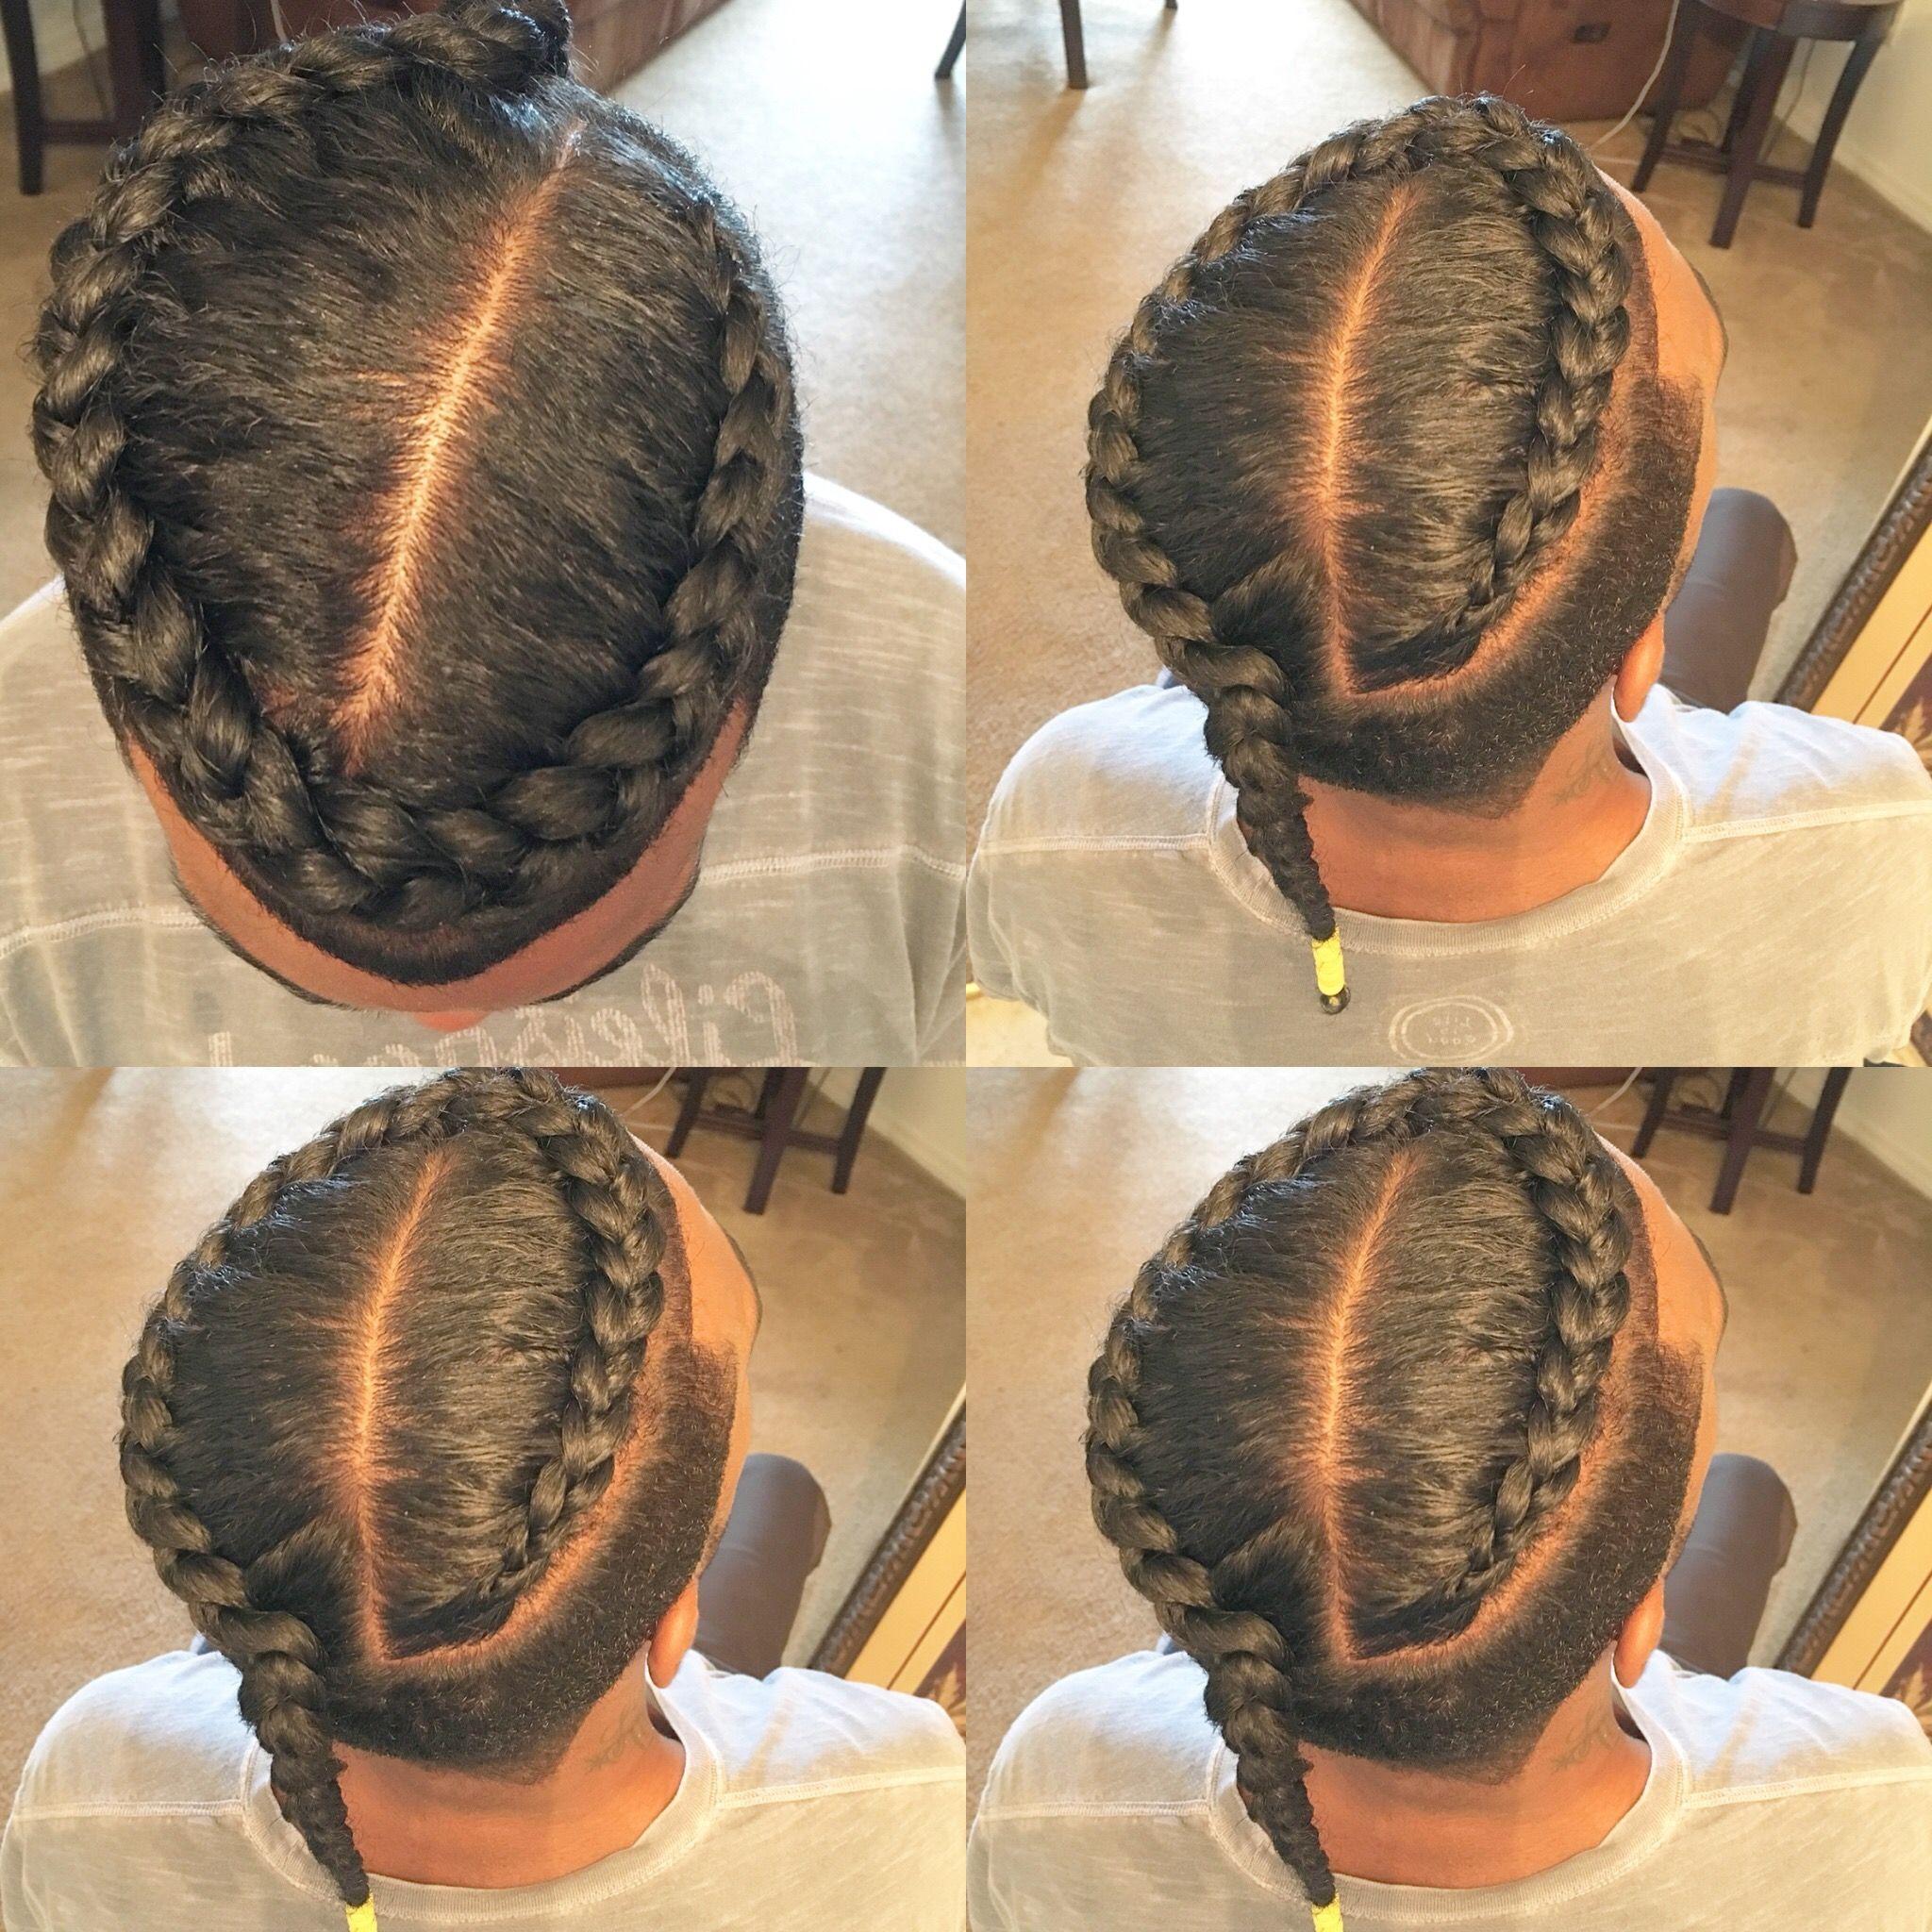 Pin by 🌈🌻𝓎𝑜𝓊𝓇 𝒿𝓊𝓈𝓉 𝓎𝑒𝓁𝓁𝑜𝓌🌻🌈 on Braids